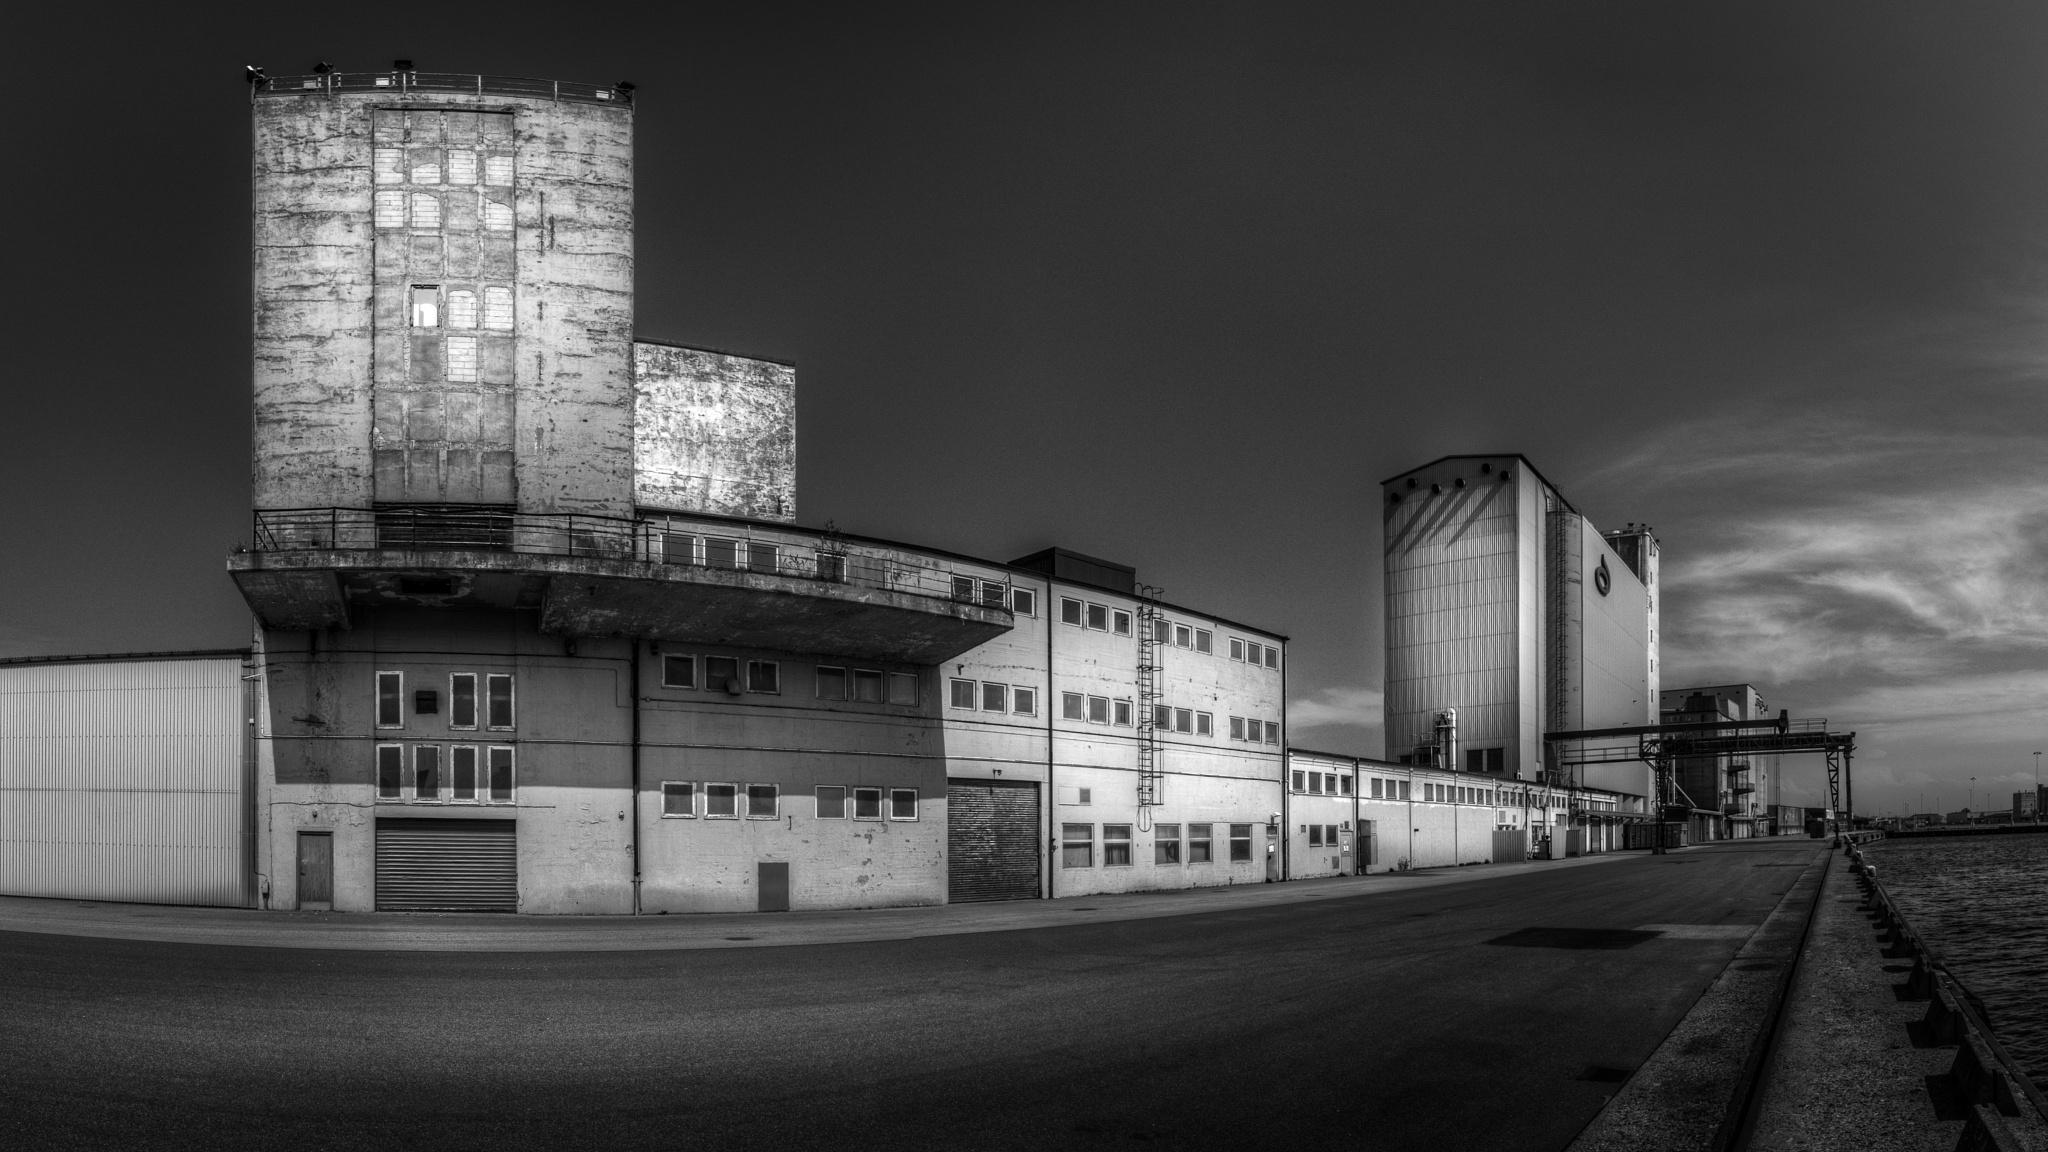 Grain silos by Mirza Buljusmic